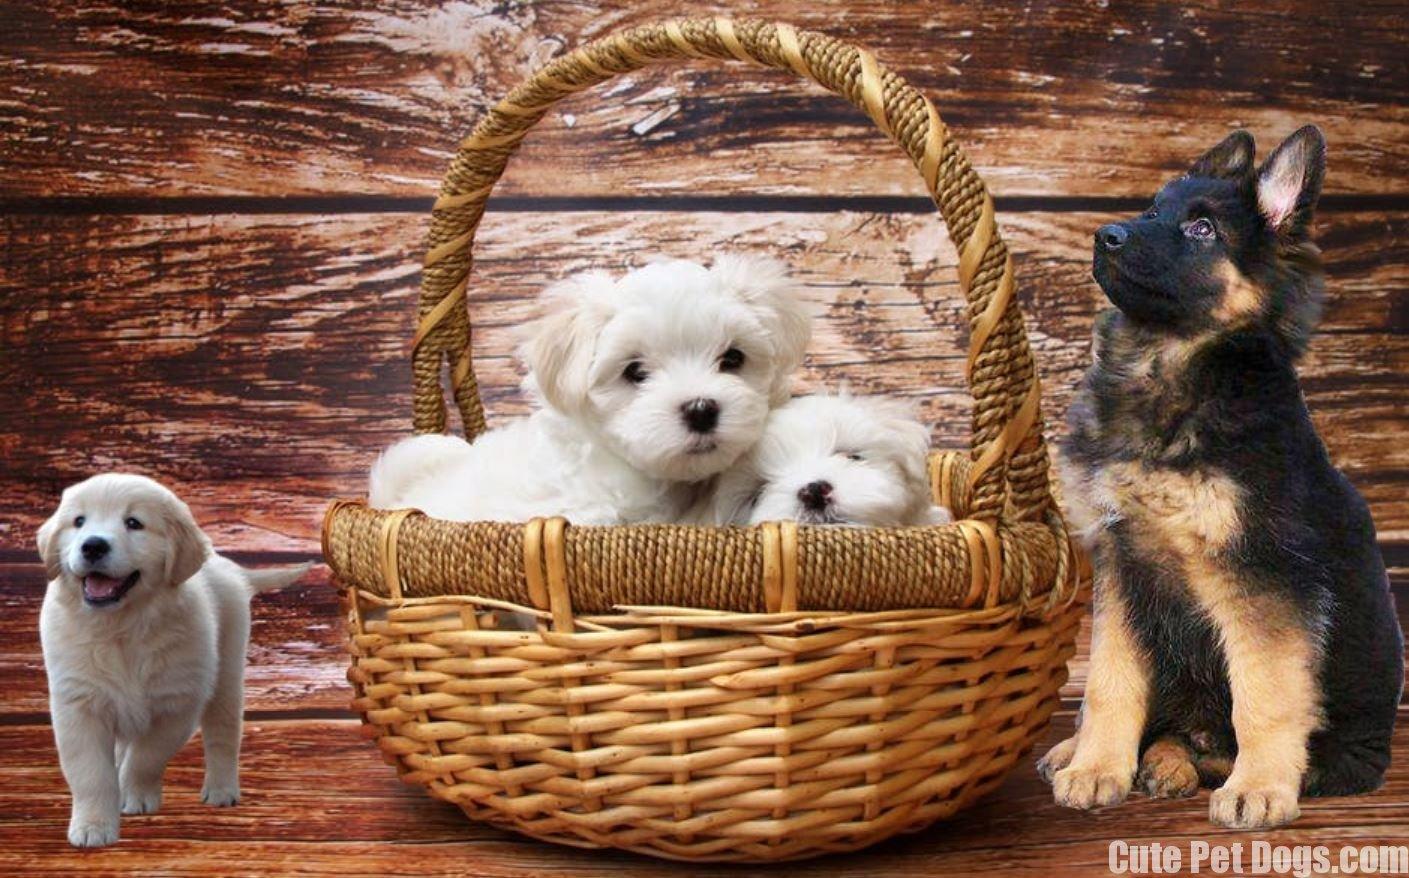 Cute Pet Dogs Cute Puppies Cute Dogs Cute Dog Breeds